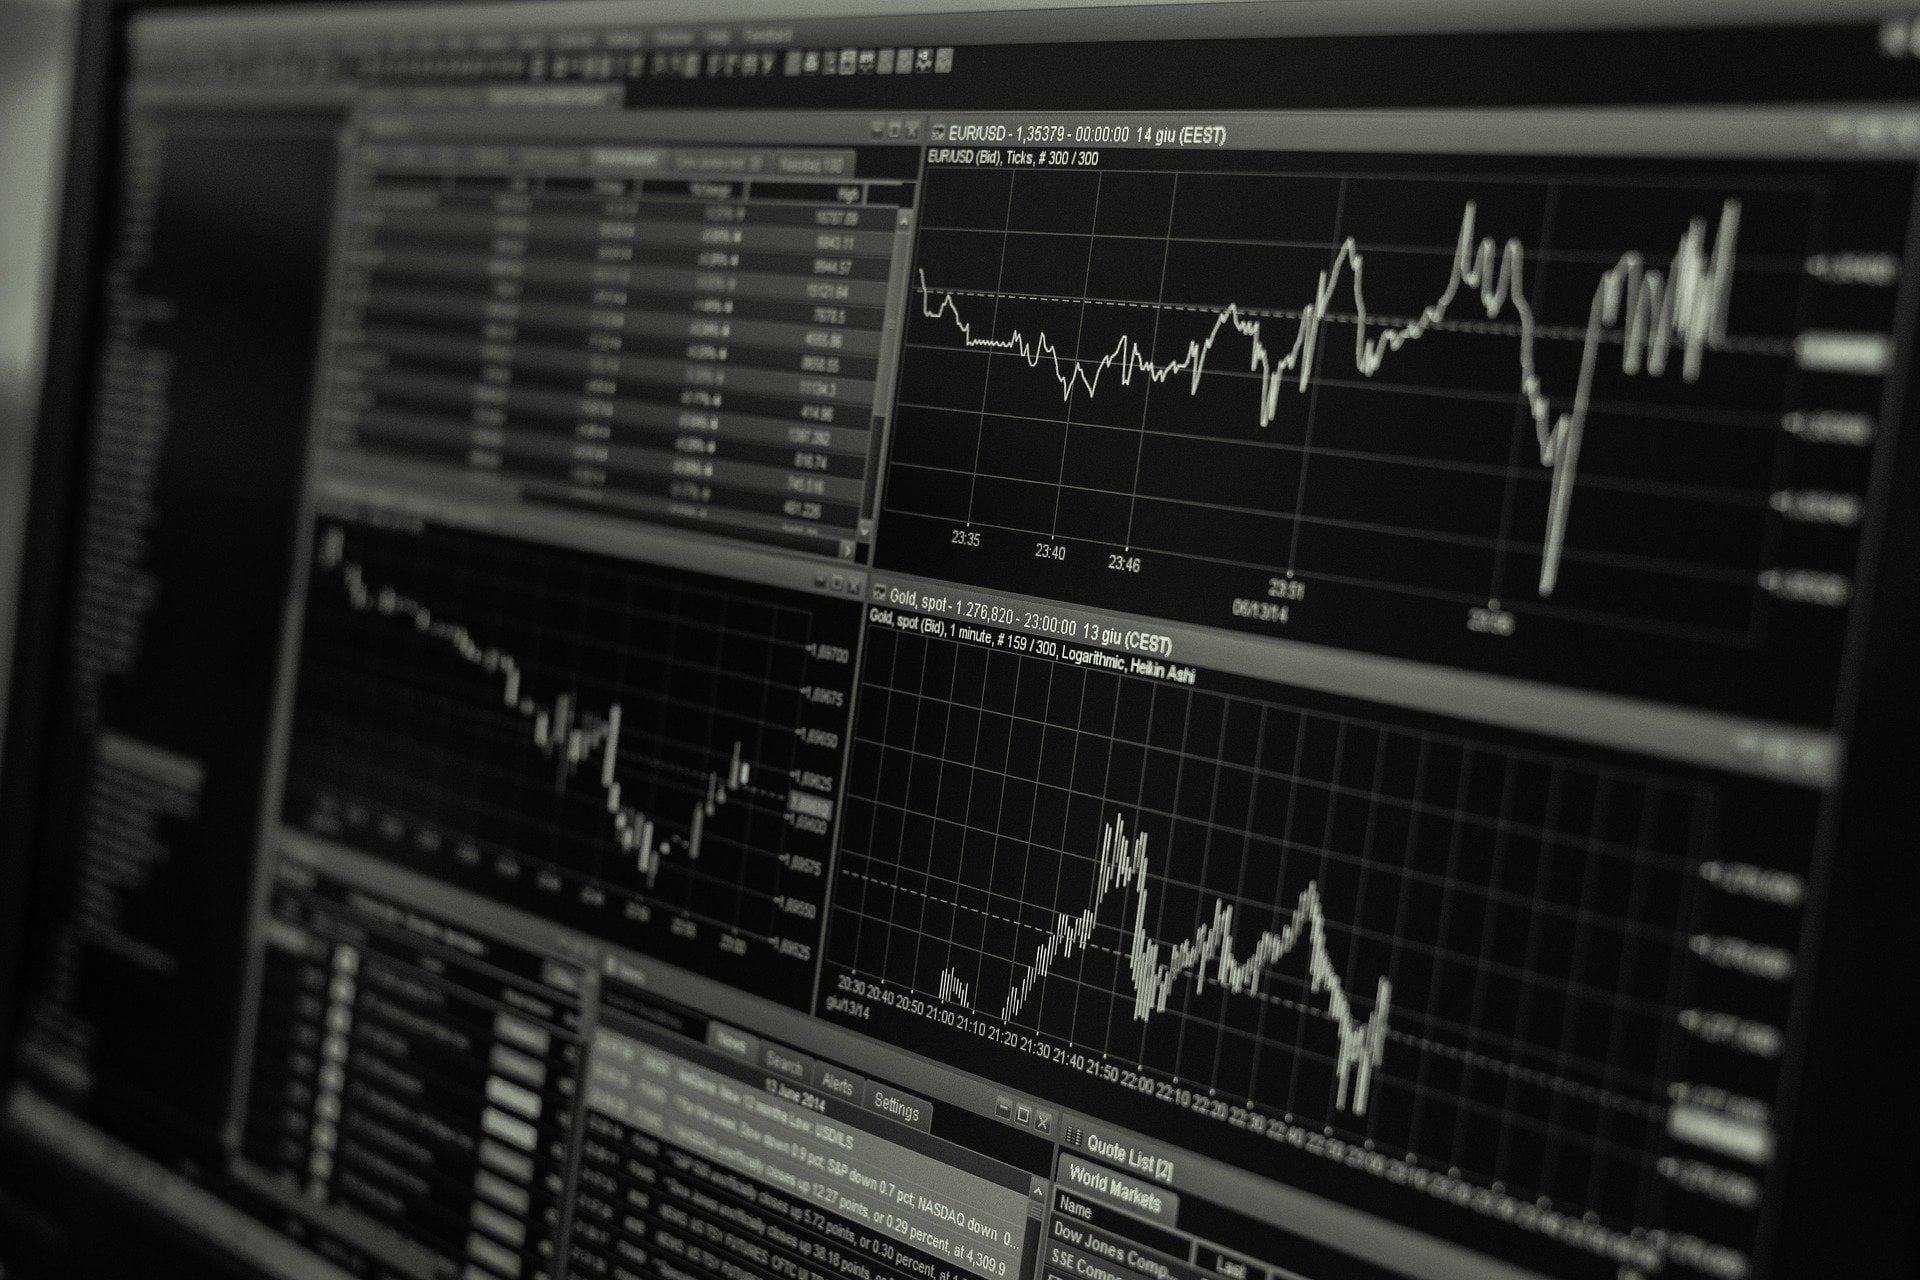 Dúvidas sobre investimentos